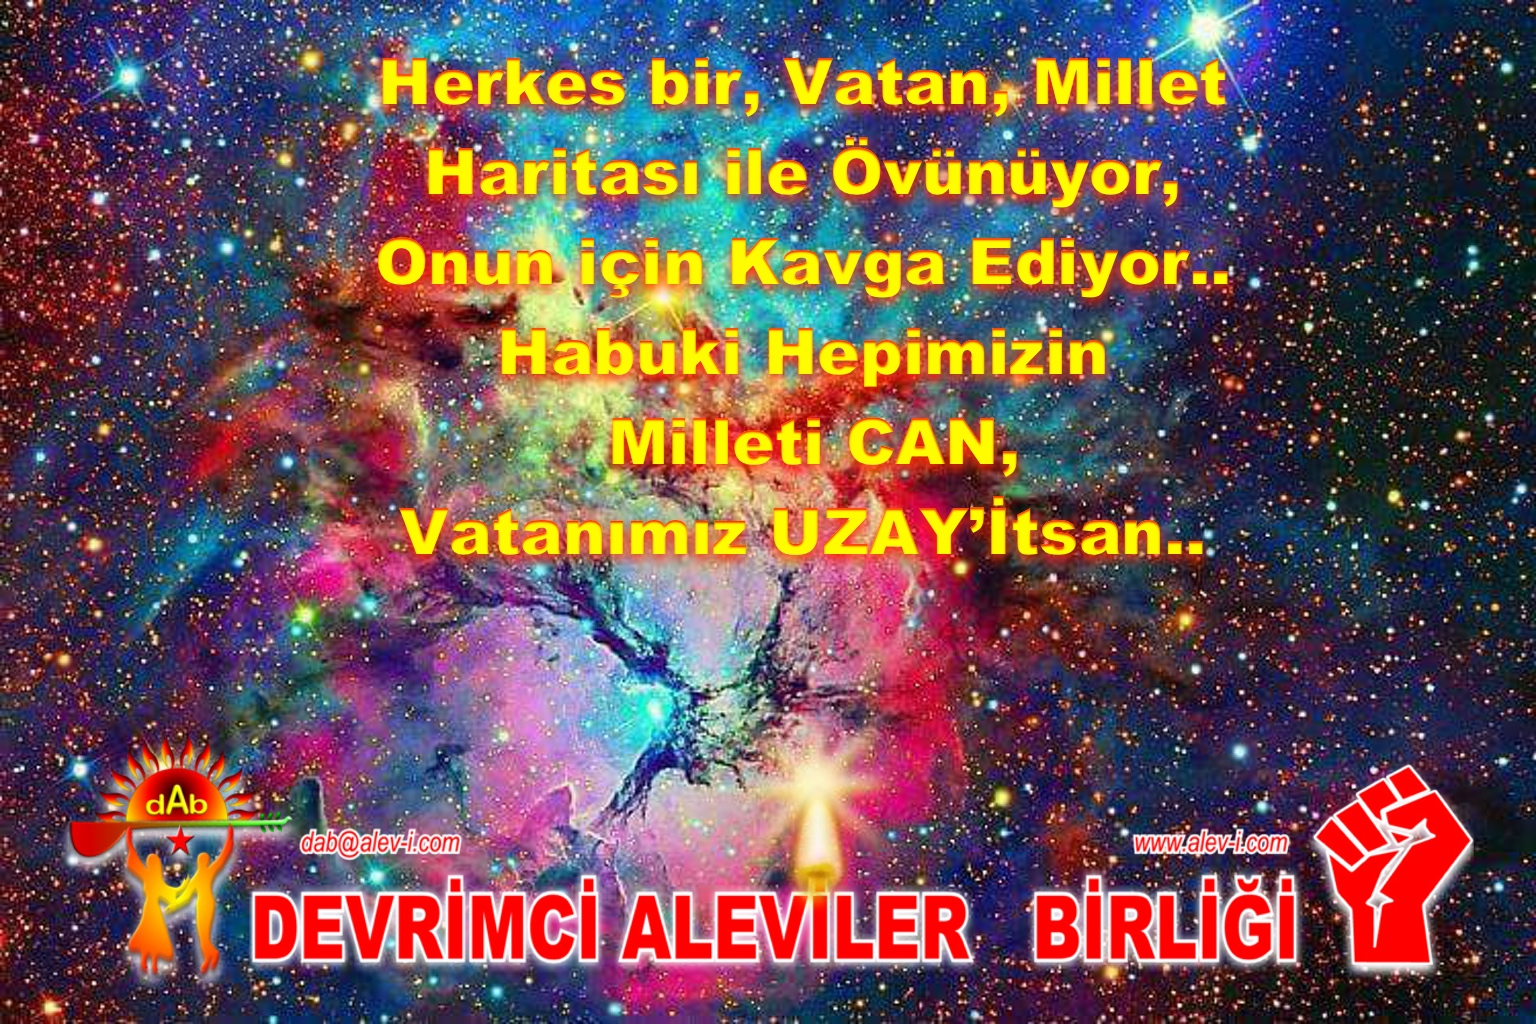 Devrimci Aleviler Birliği DAB Alevi Kızılbaş Bektaşi pir sultan cem hz Ali 12 imam semah Feramuz Şah Acar vatan millet uzayistan